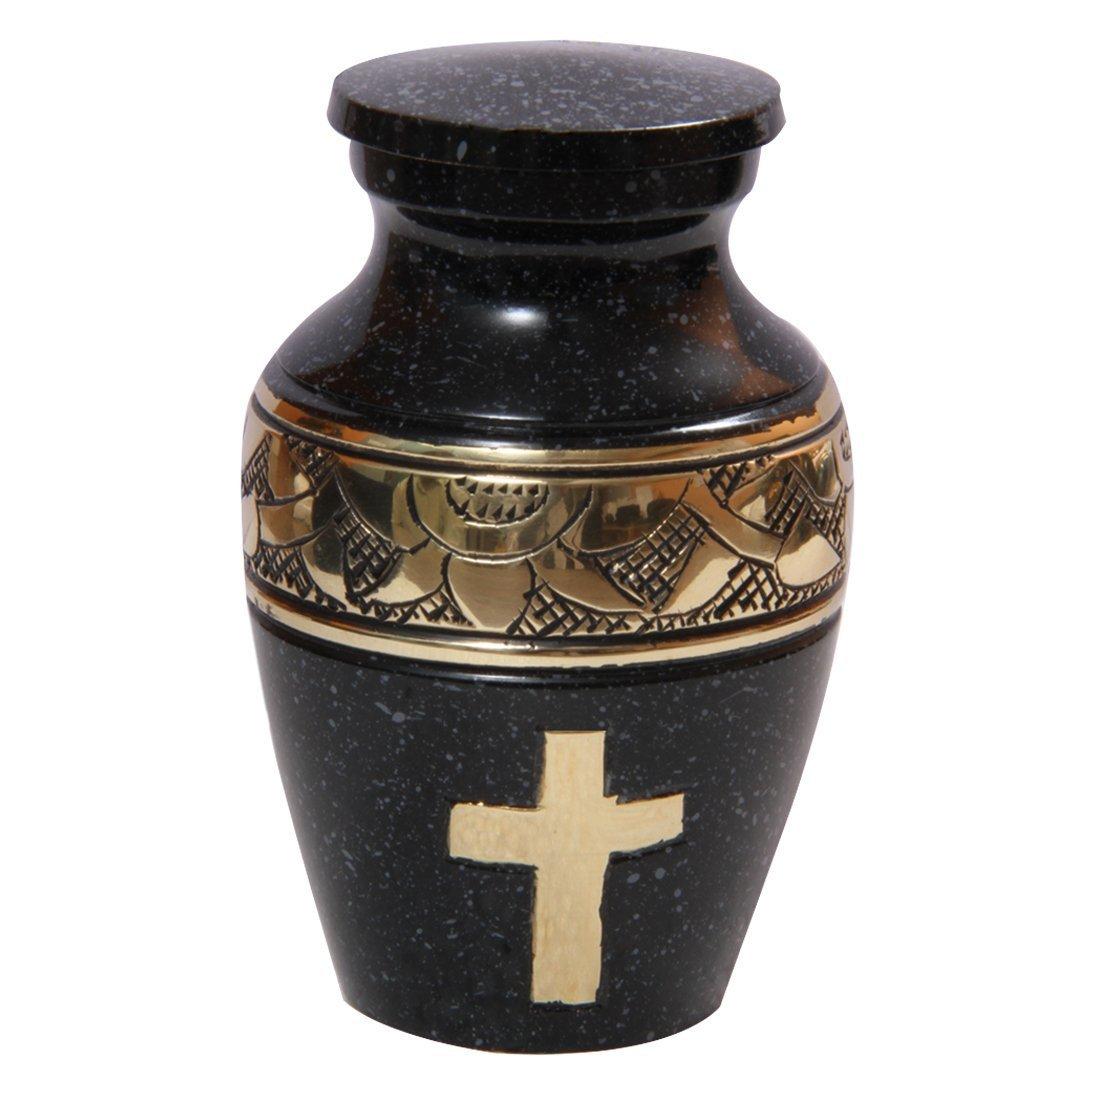 Custom Golden Cross Engraved Mini Keepsake Urn for Human Cremains, Human Cremation Urns